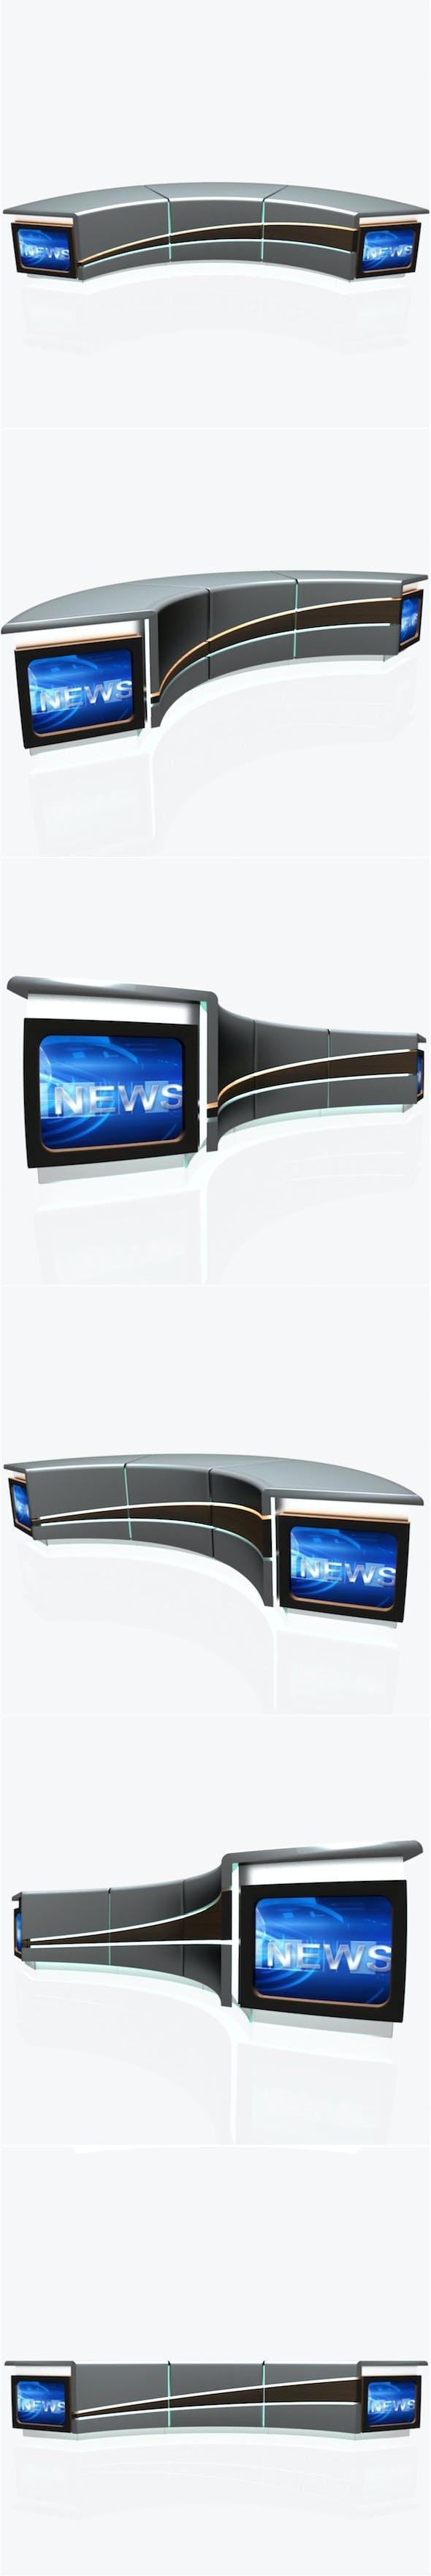 Tv Studio News Desk 004 - 3DOcean Item for Sale